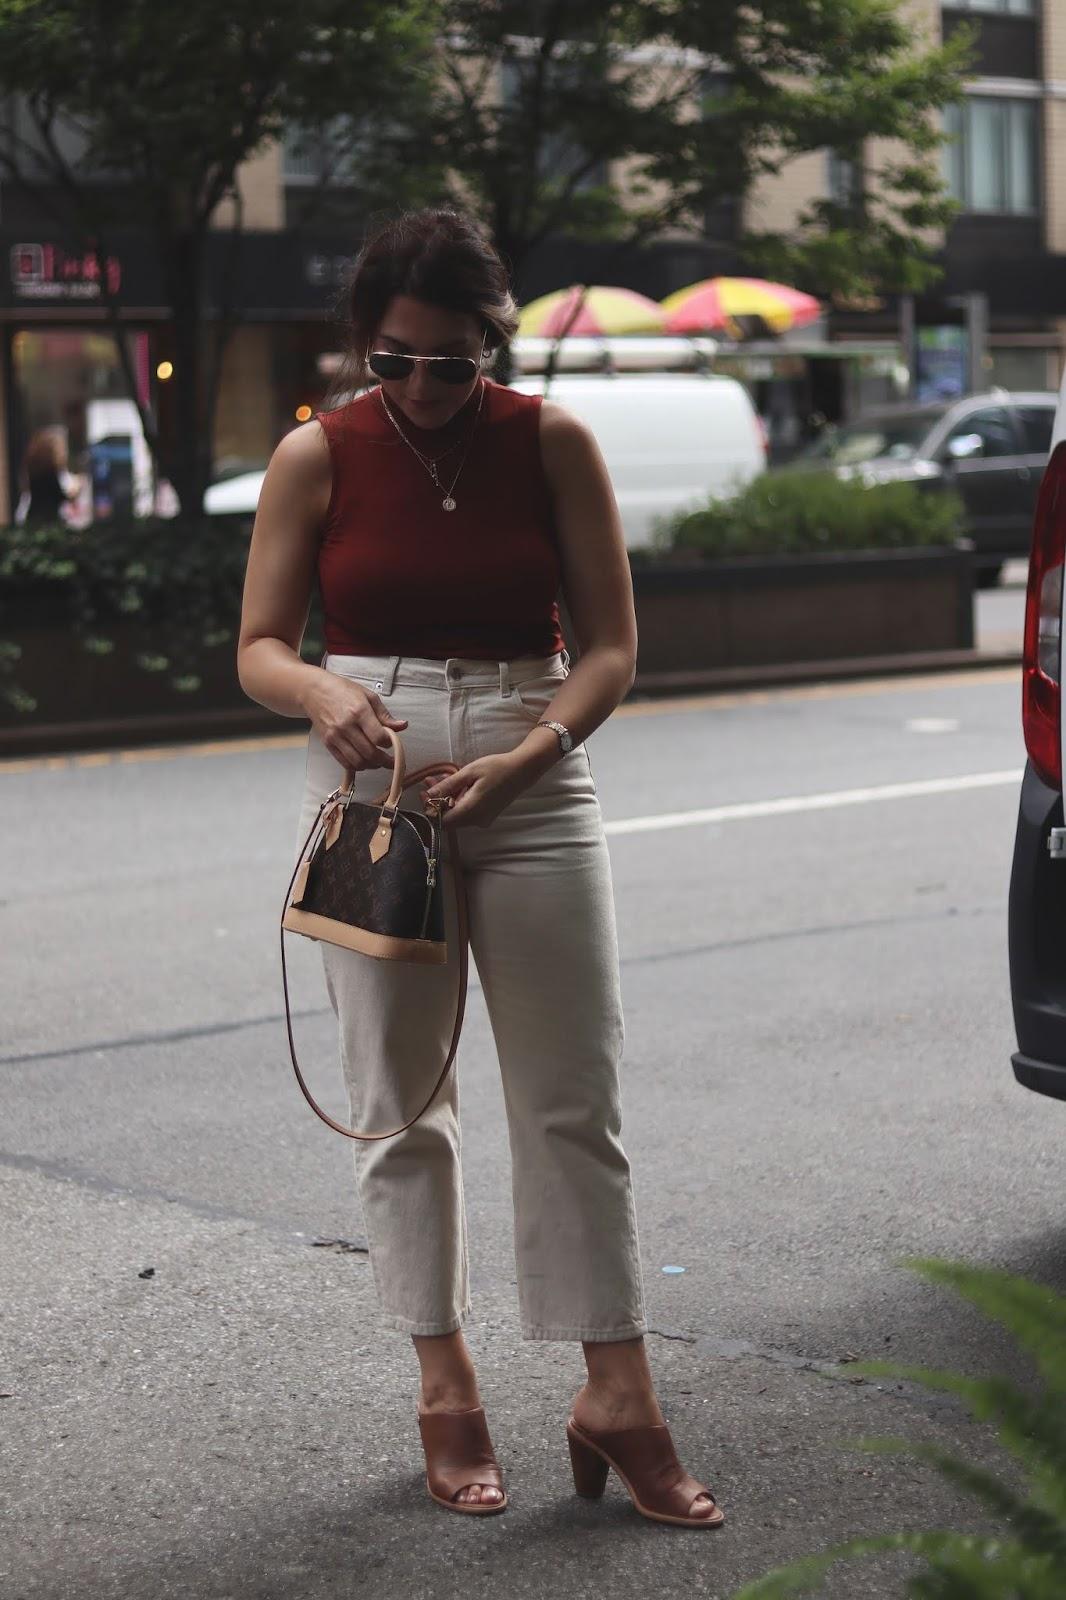 le chateau mock neck top outfit & other stories jeans louis vuitton bb alma monogram outfit idea